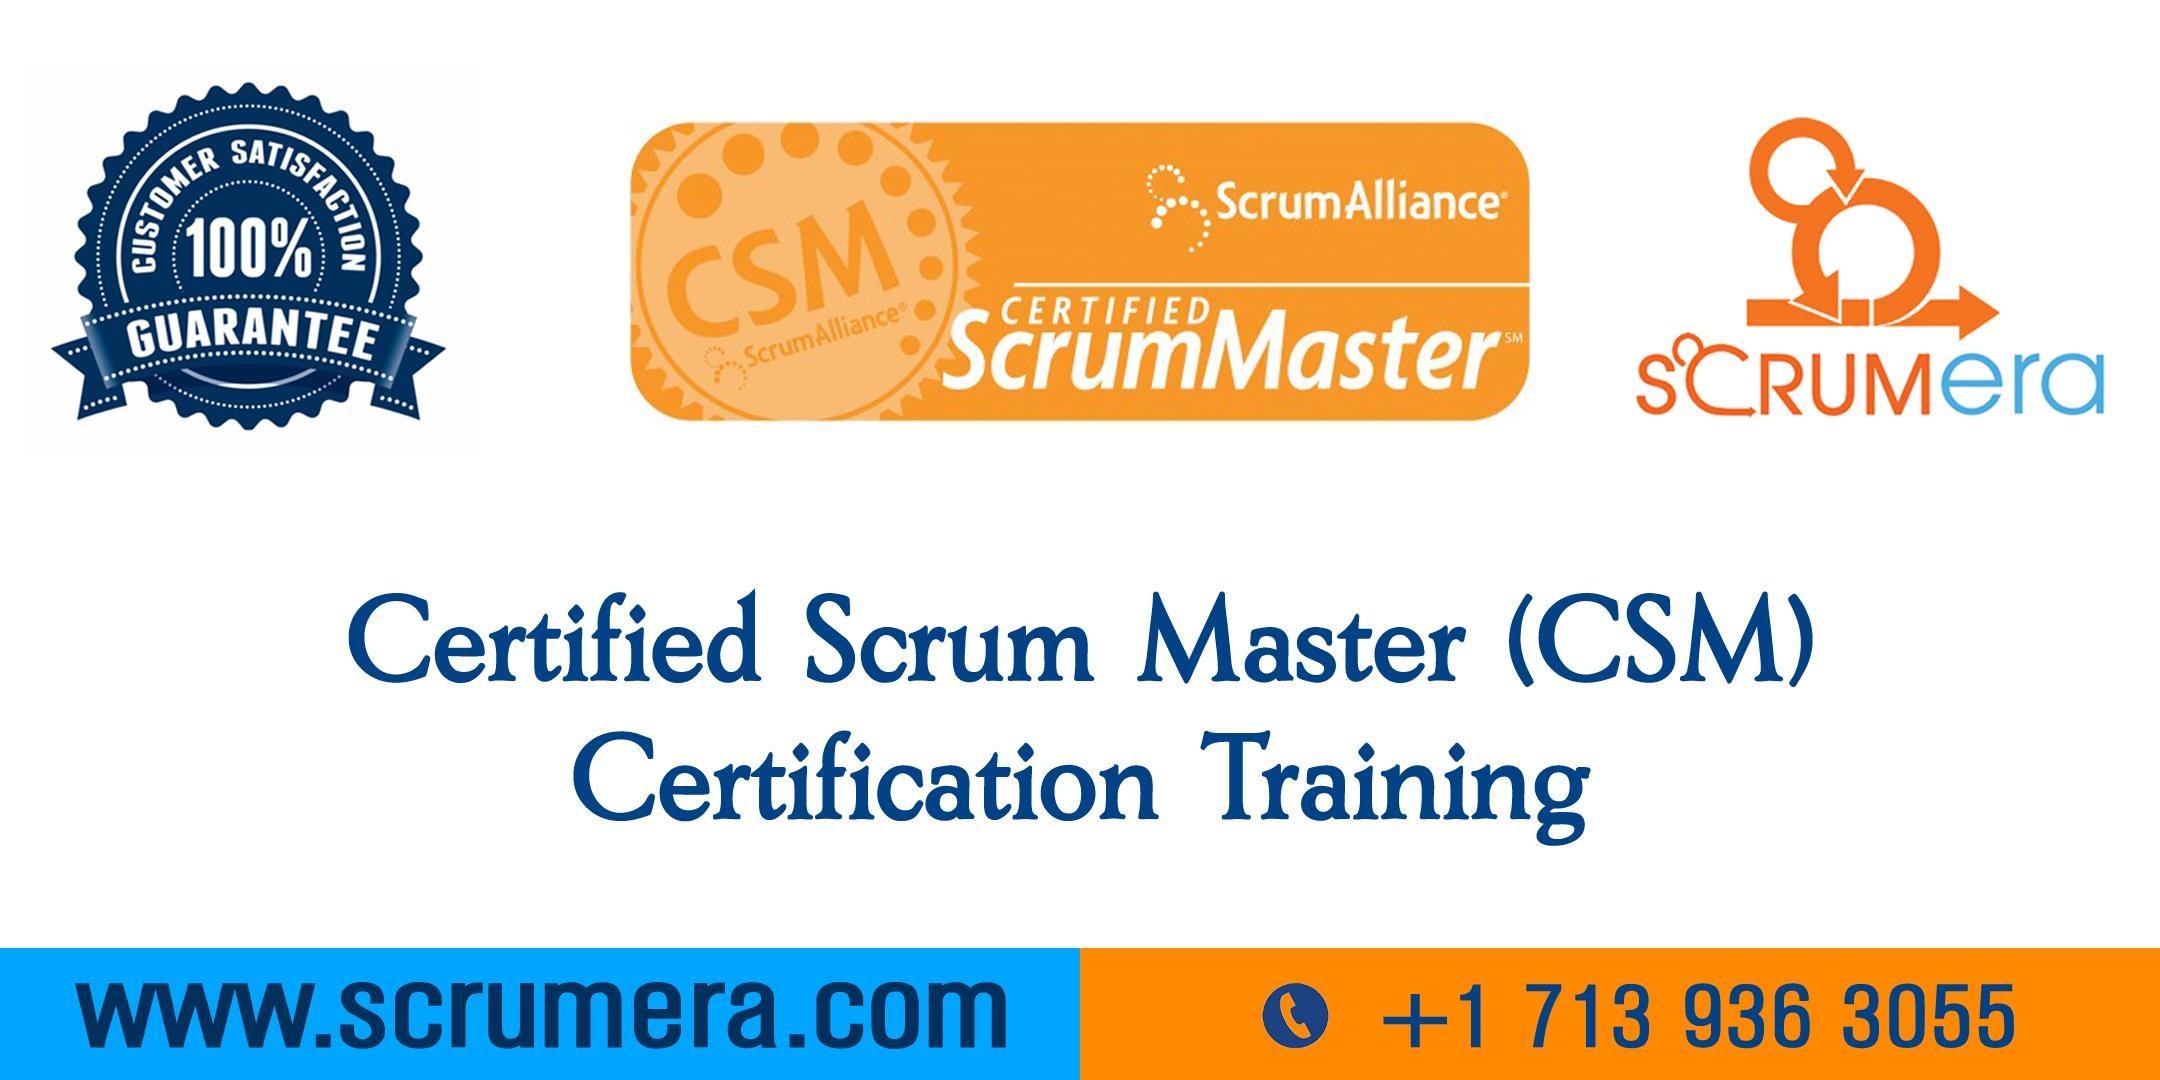 Scrum Master Certification | CSM Training | CSM Certification Workshop | Certified Scrum Master (CSM) Training in Pasadena, TX | ScrumERA